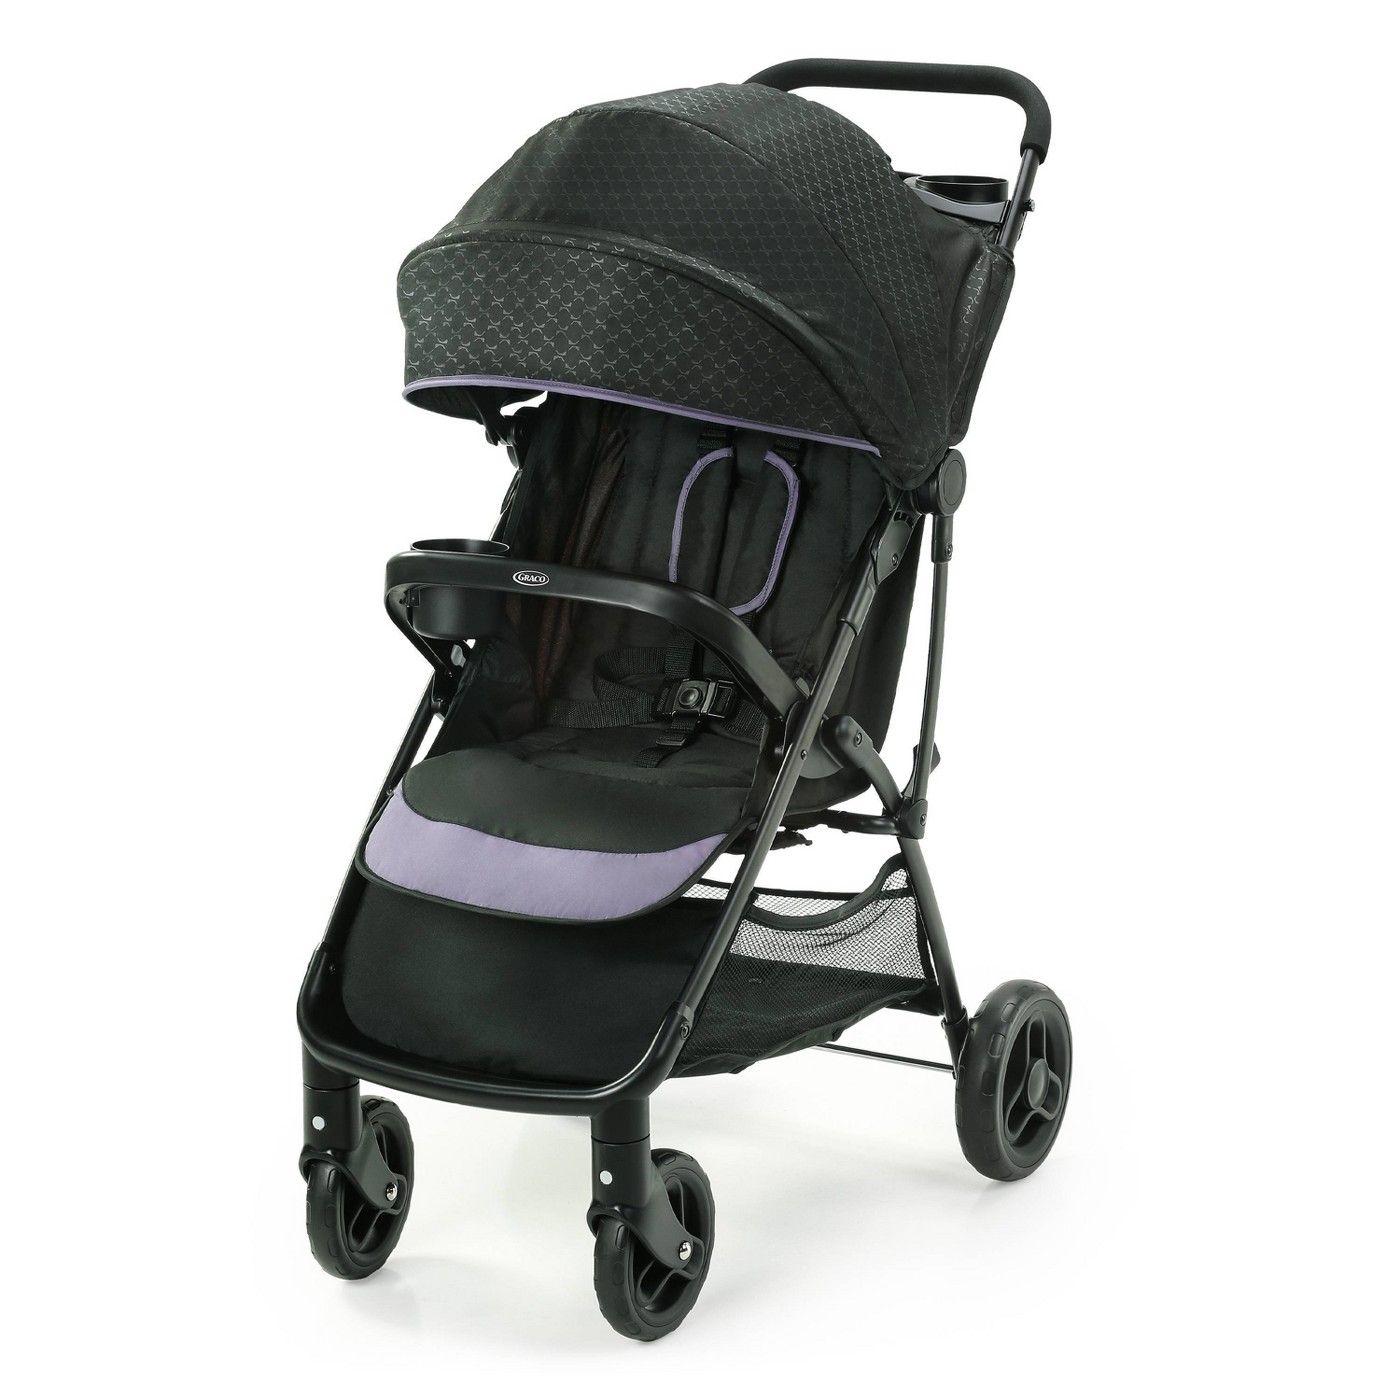 Graco NimbleLite Baby Stroller Affiliate NimbleLite,